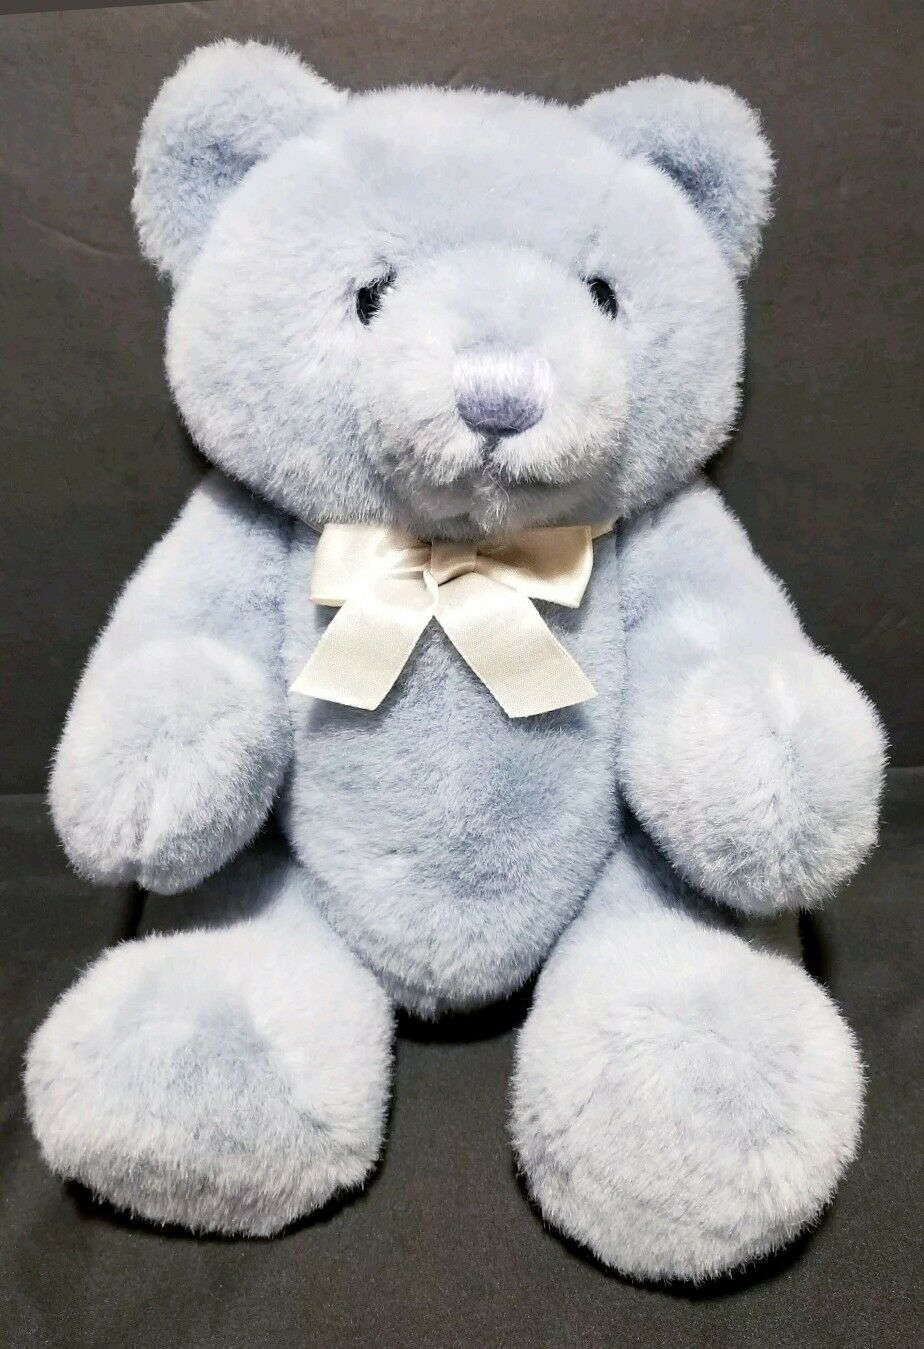 Vintage DAKIN Teddy Bear Blau Lavender 13  Plush Jointed Legs Head Rotates 1989